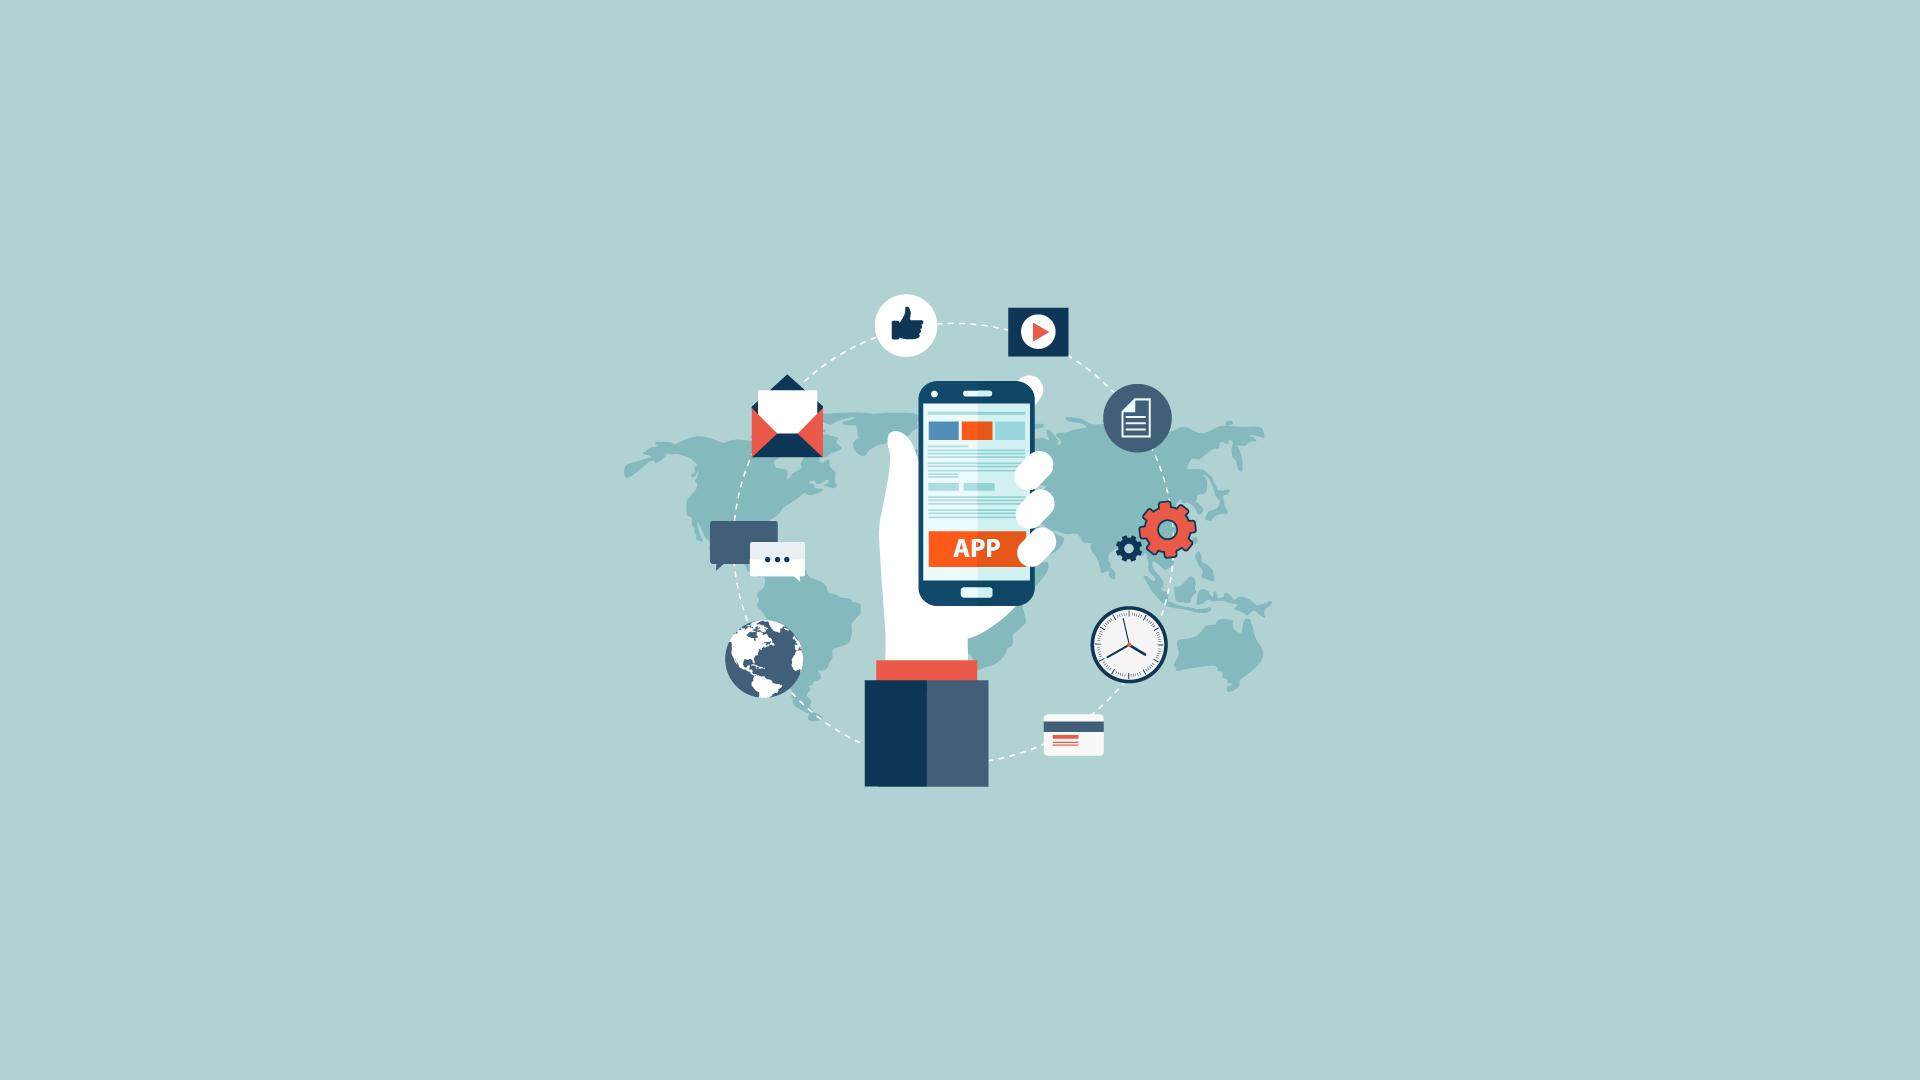 Mobile Applications Development